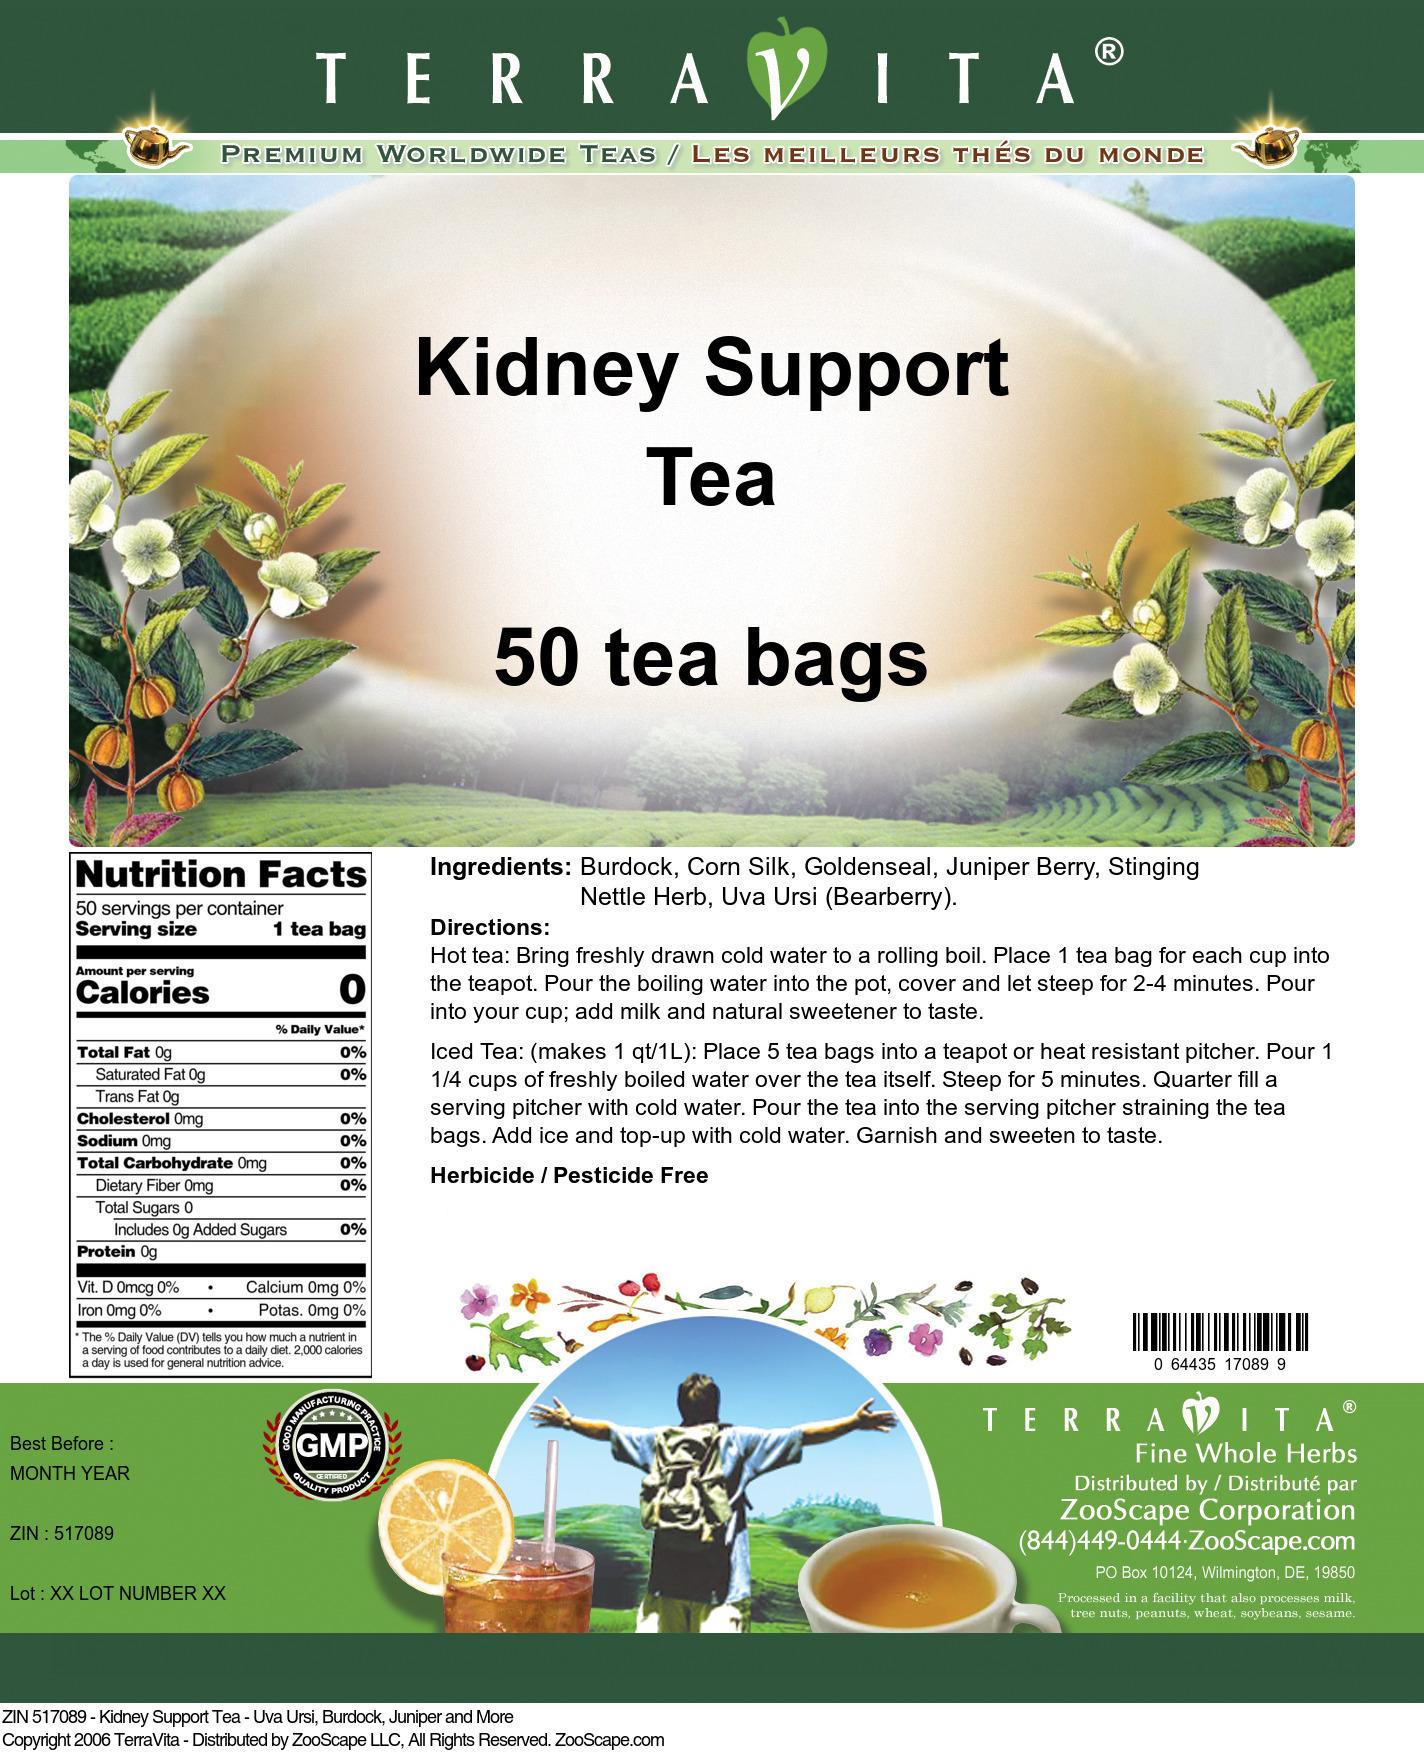 Kidney Support Tea - Uva Ursi, Burdock, Juniper and More